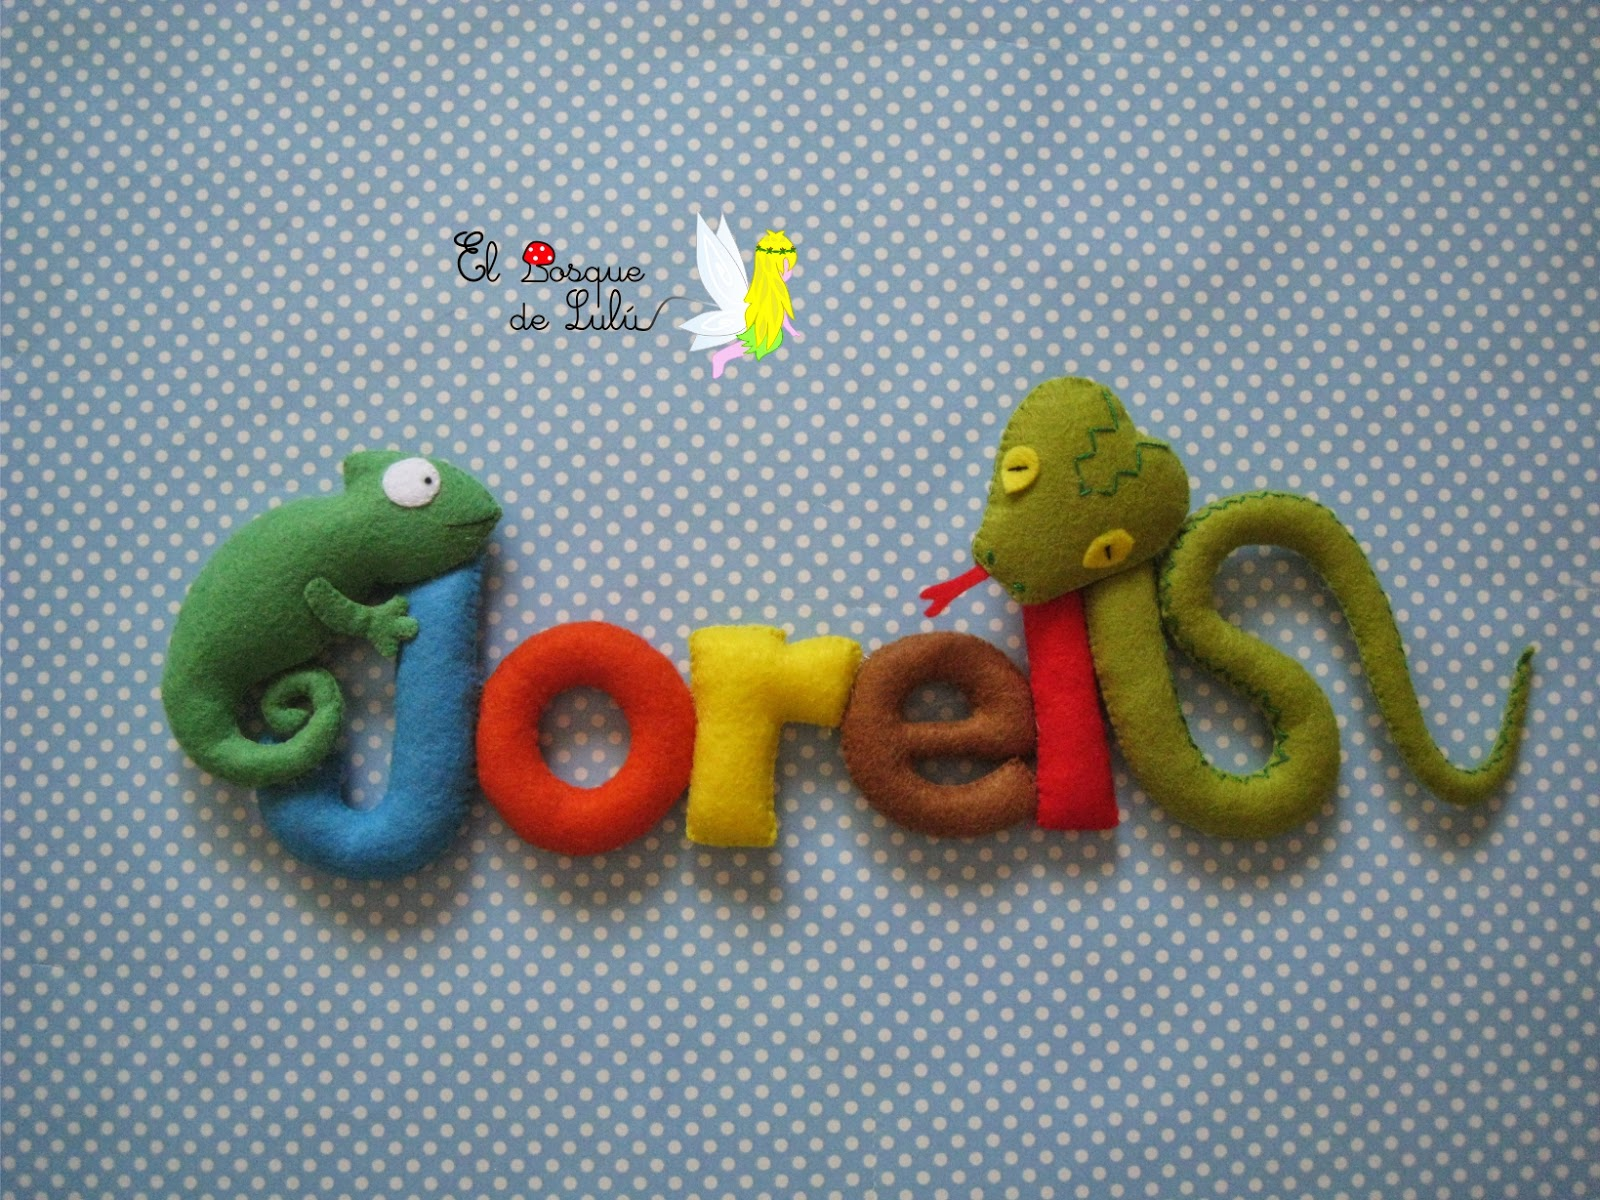 nombre-decorativo-fieltro-infantil-regalo-nacimiento-decoración-name-banner